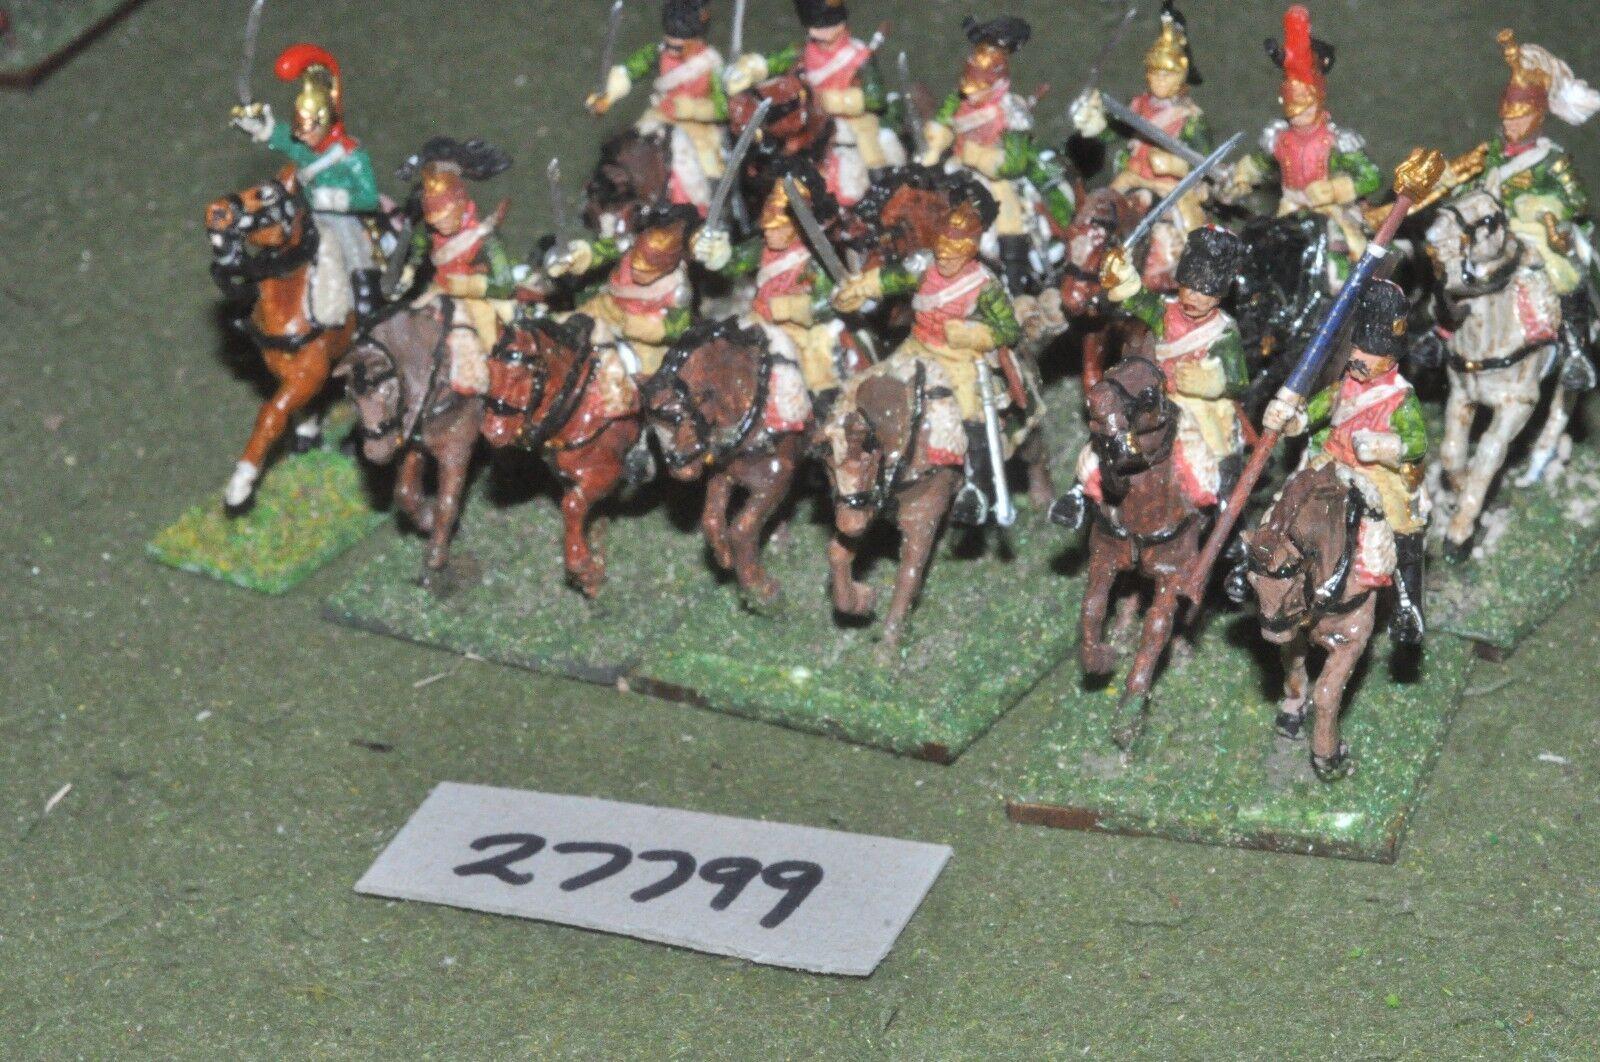 25mm napoleonic   french - dragoons (plastic) 12 figures - cav (27799)